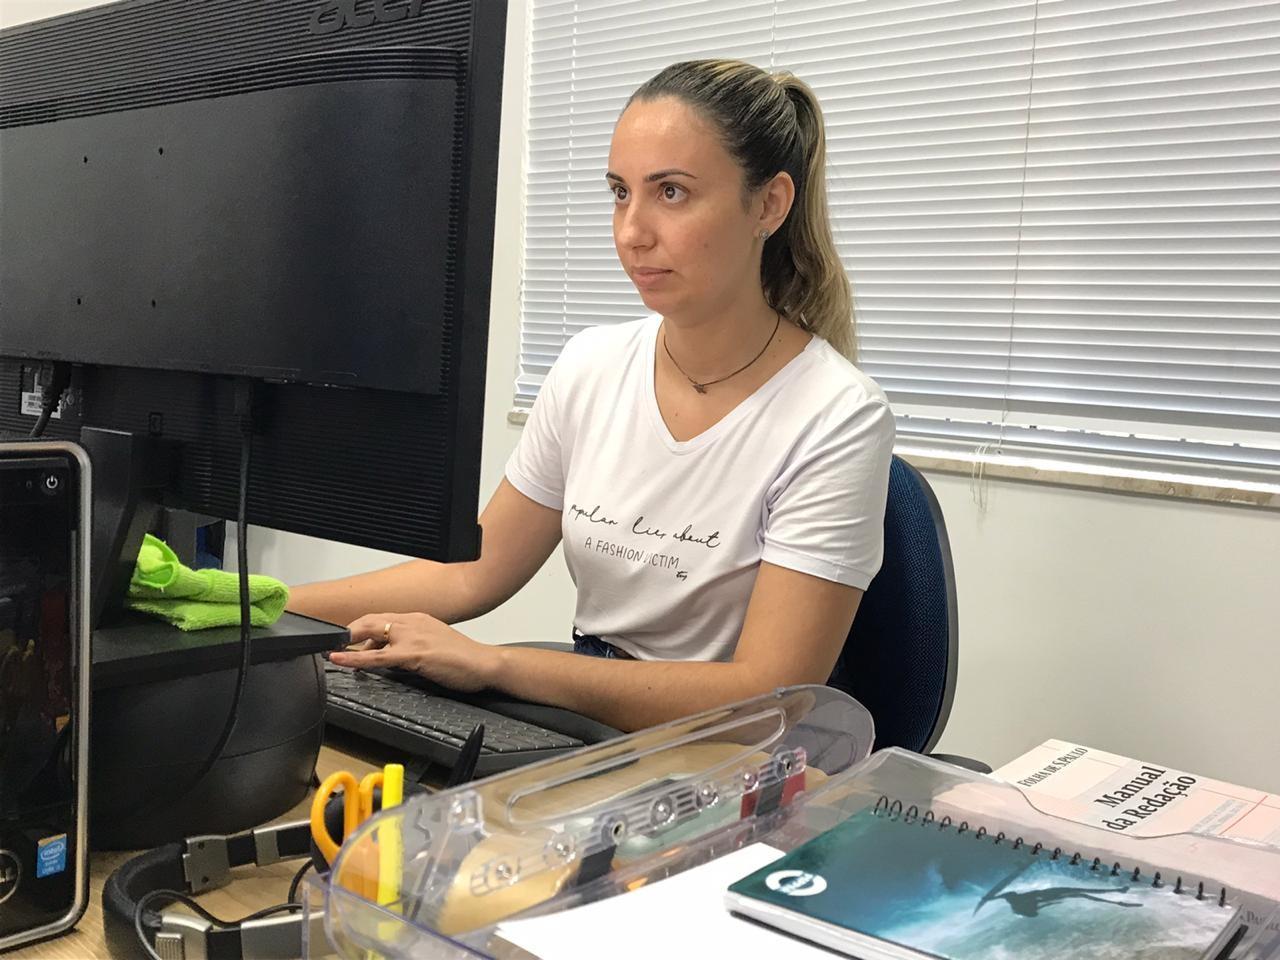 Por onde anda Gabriela Correia Araújo?